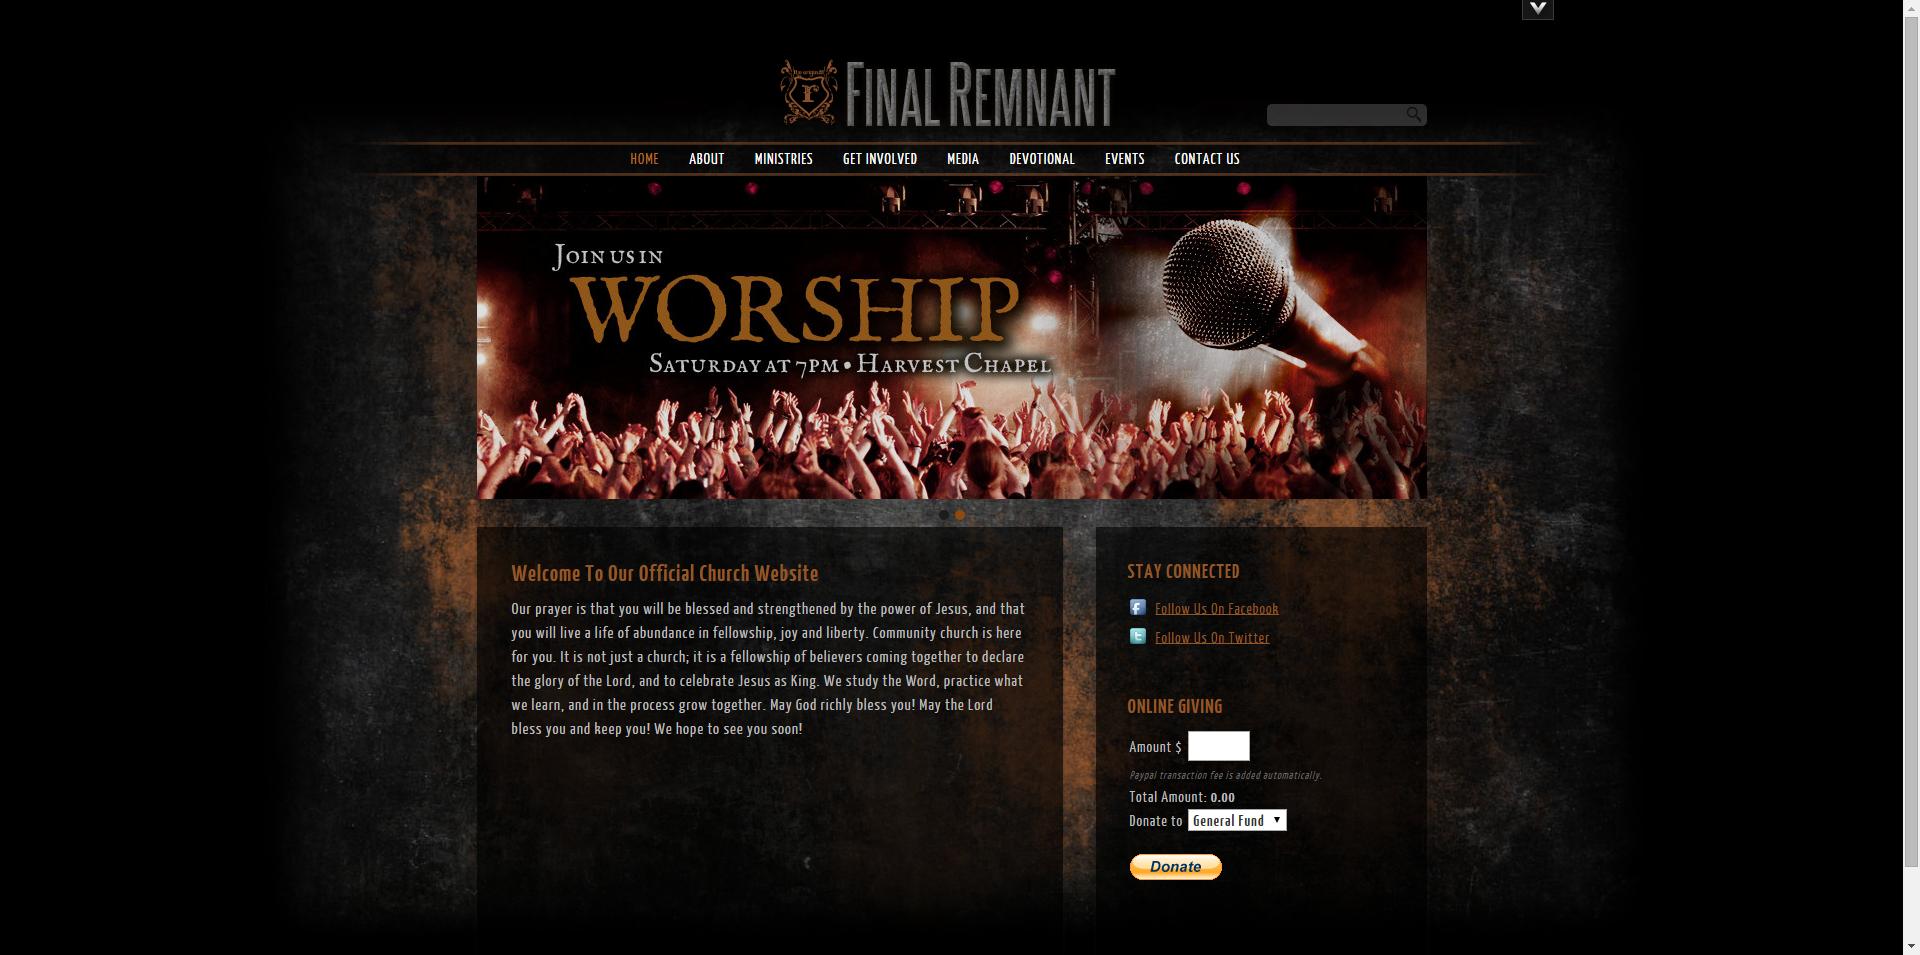 edgy website design